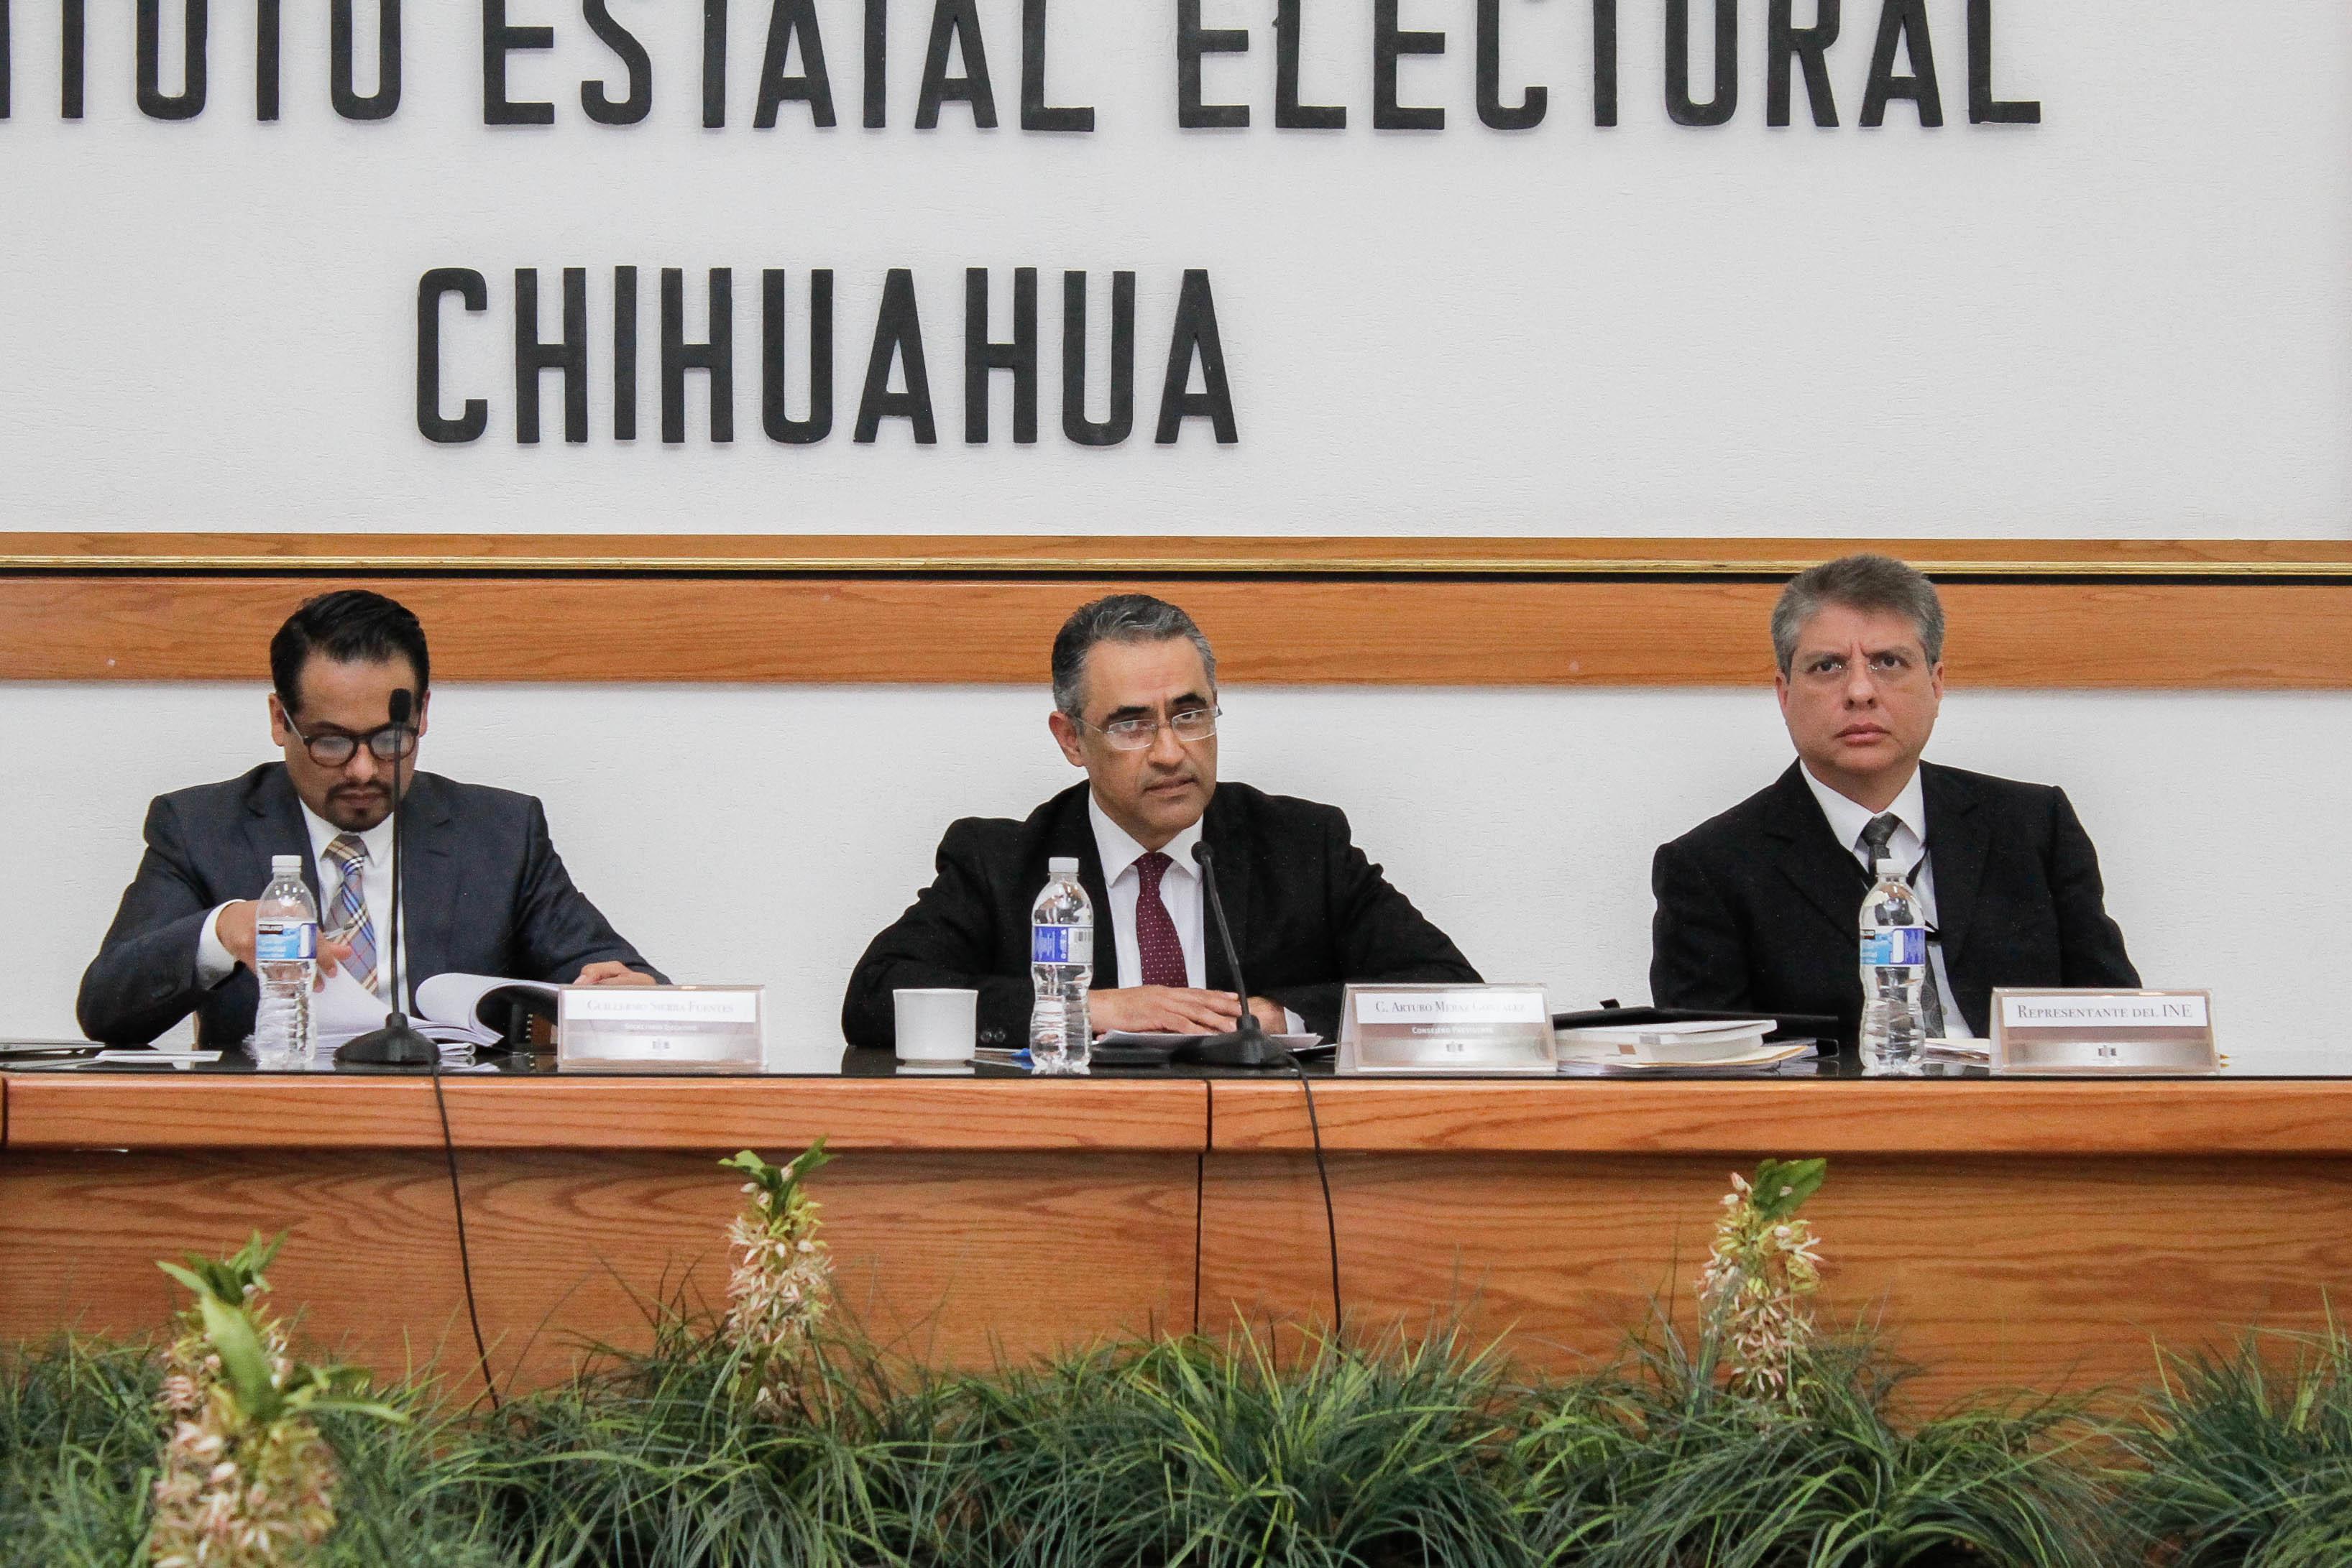 Aspirantes a candidaturas independientes tendrán un mes para recolectar firmas